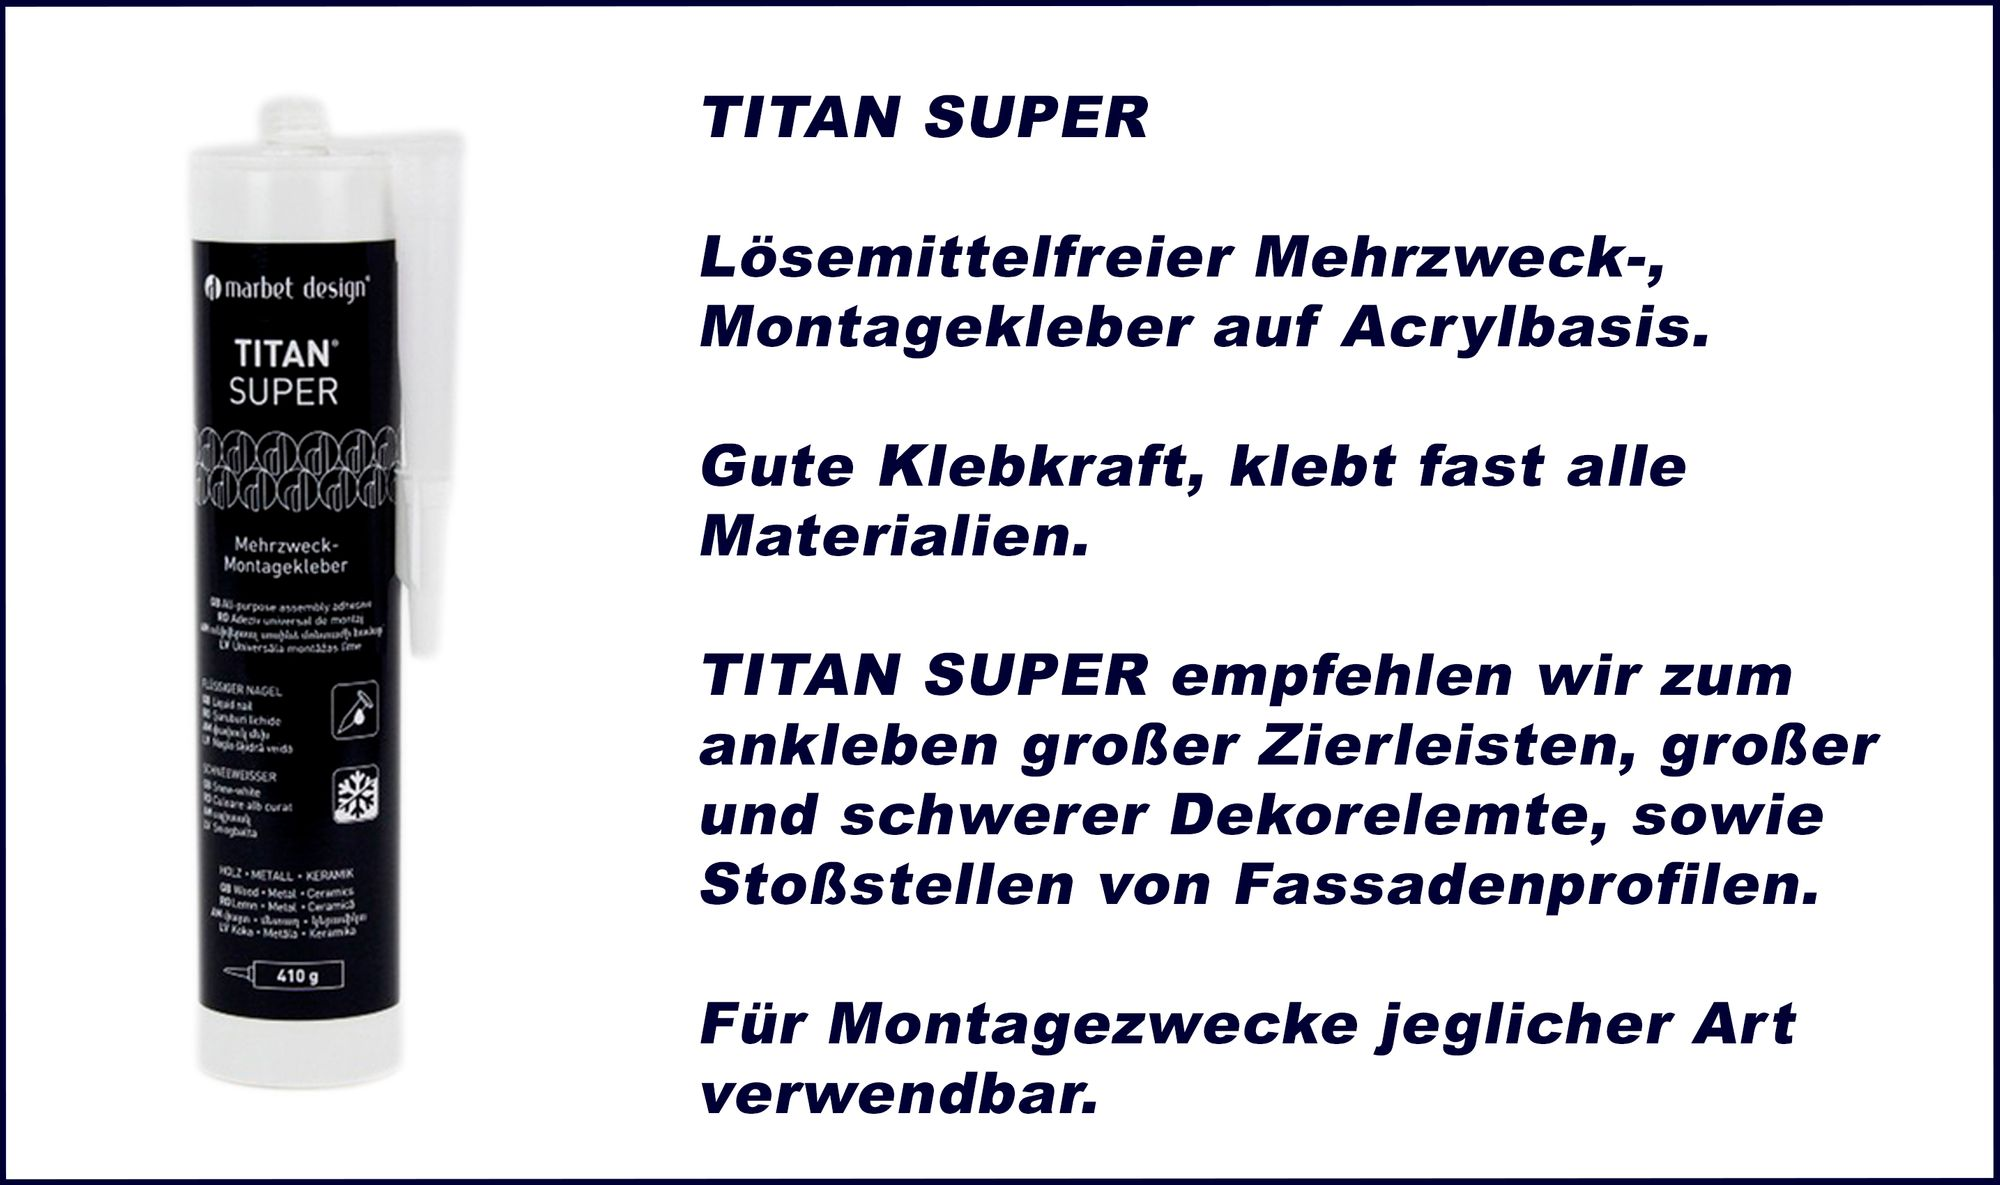 Titan Super